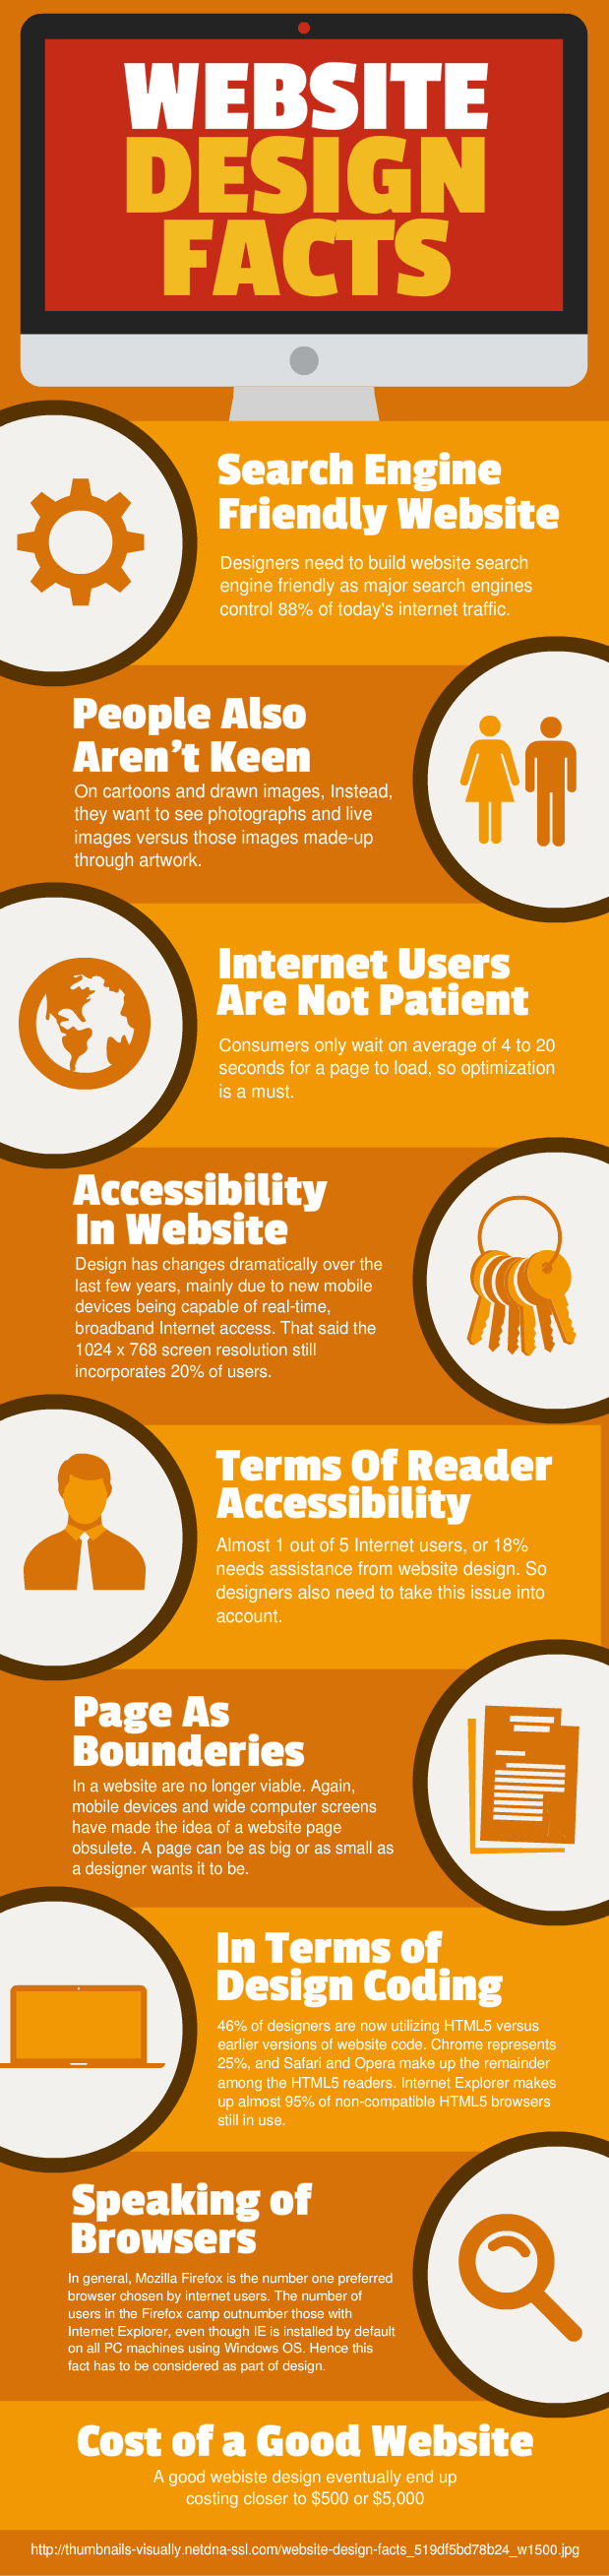 Website Design Facts Infographics - Website Design Today